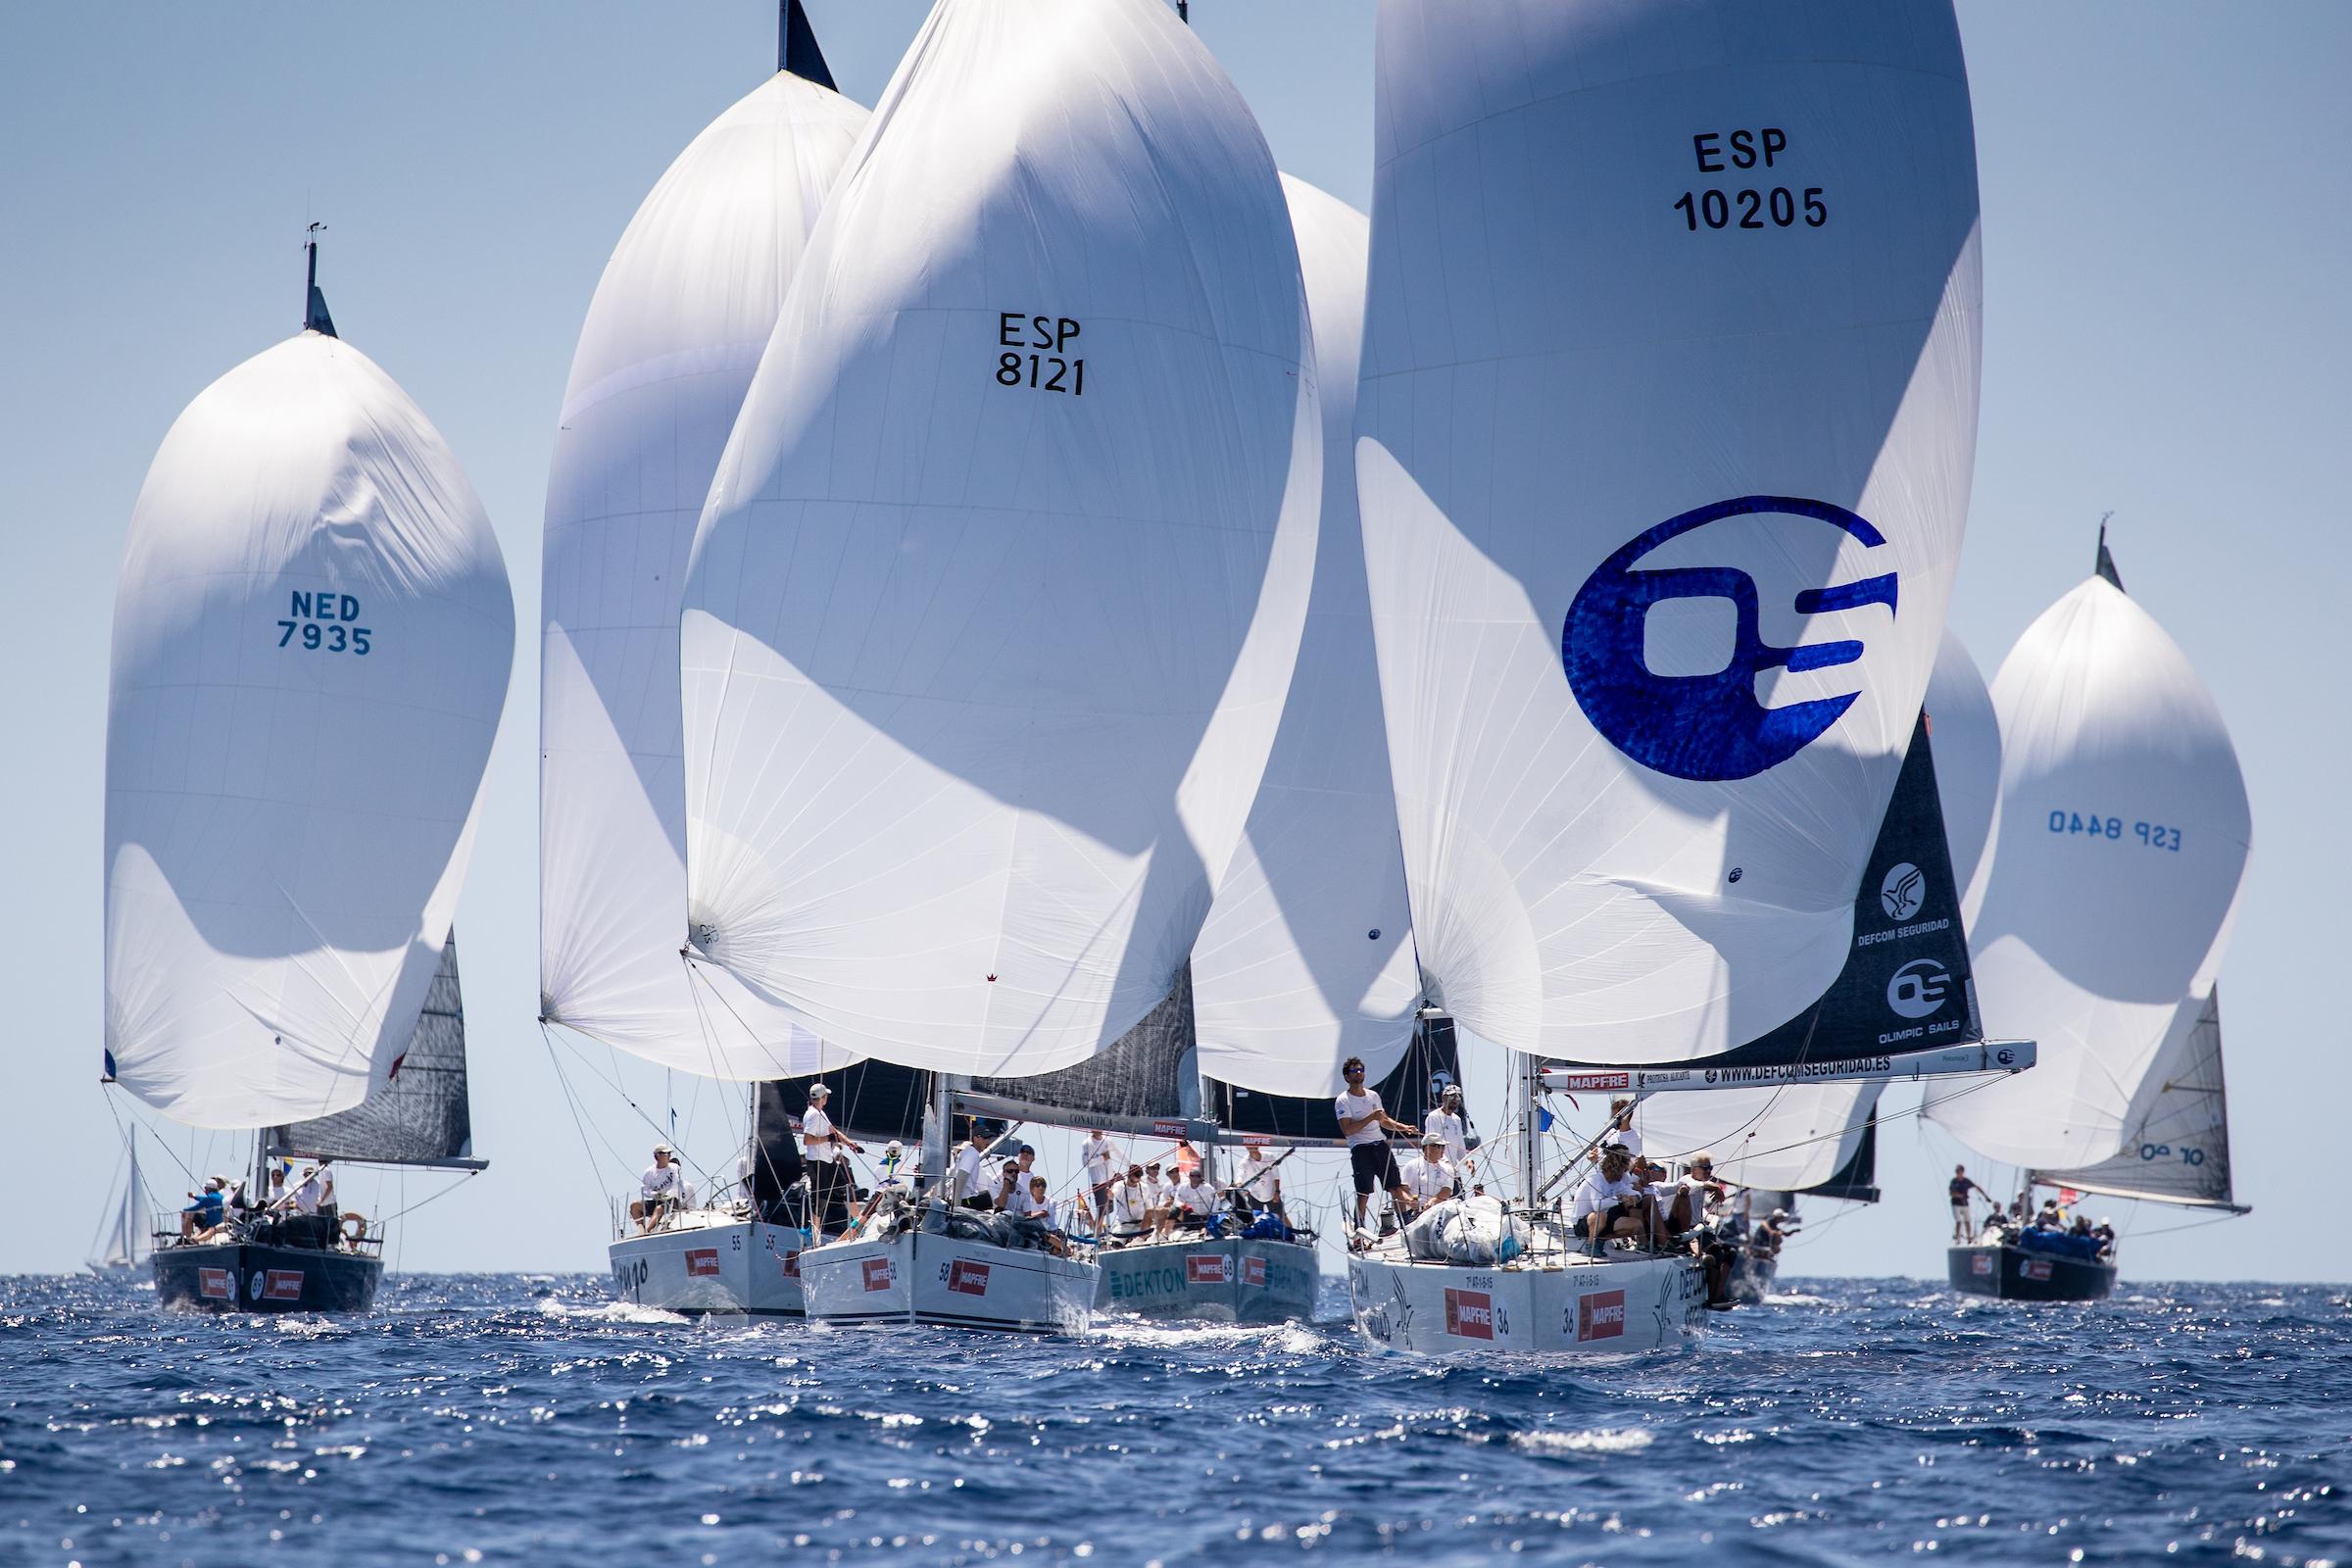 ORC 3 fleet on the Bay of Palma - Maria Muina pic